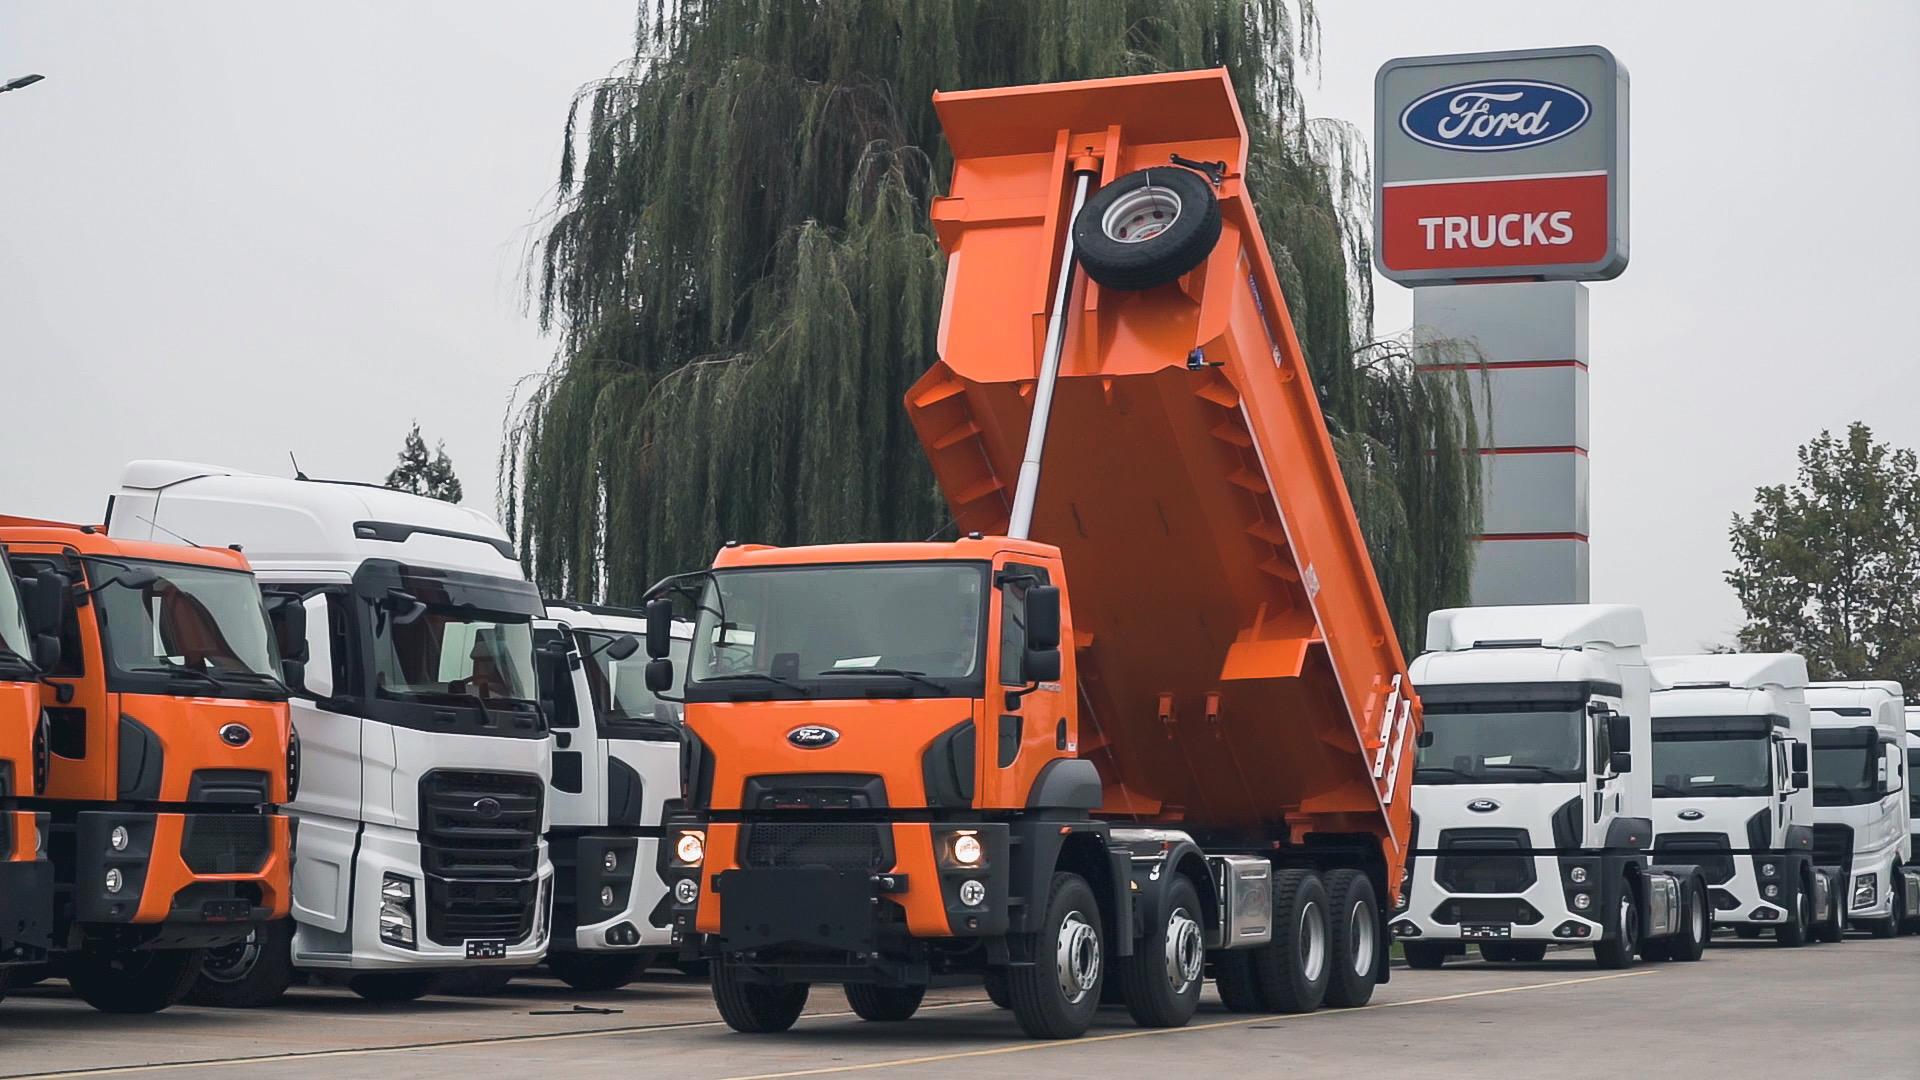 """Magia"" Cefin Trucks continuă"